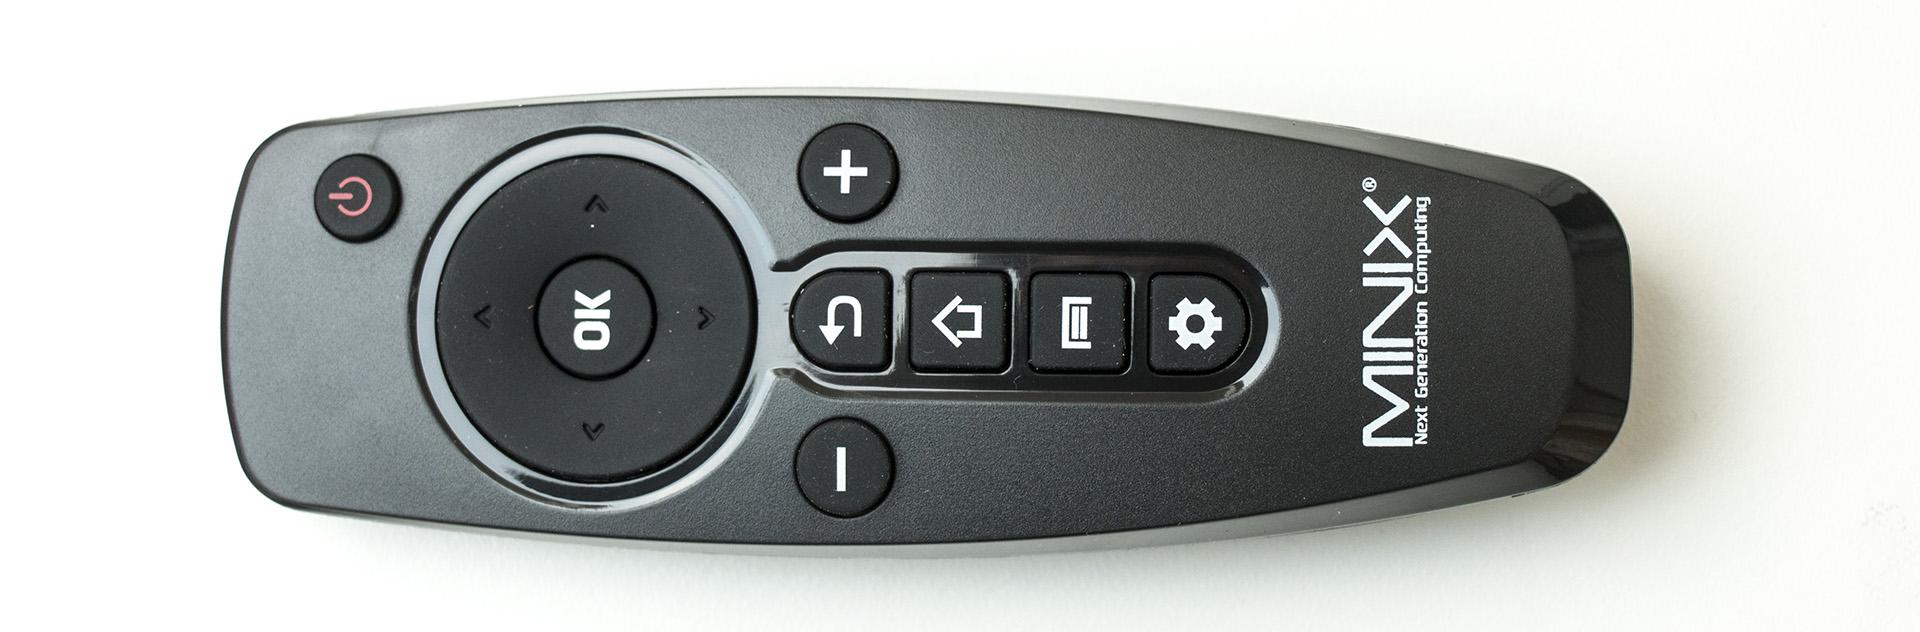 Minix Neo X8 Plus IMG_0211